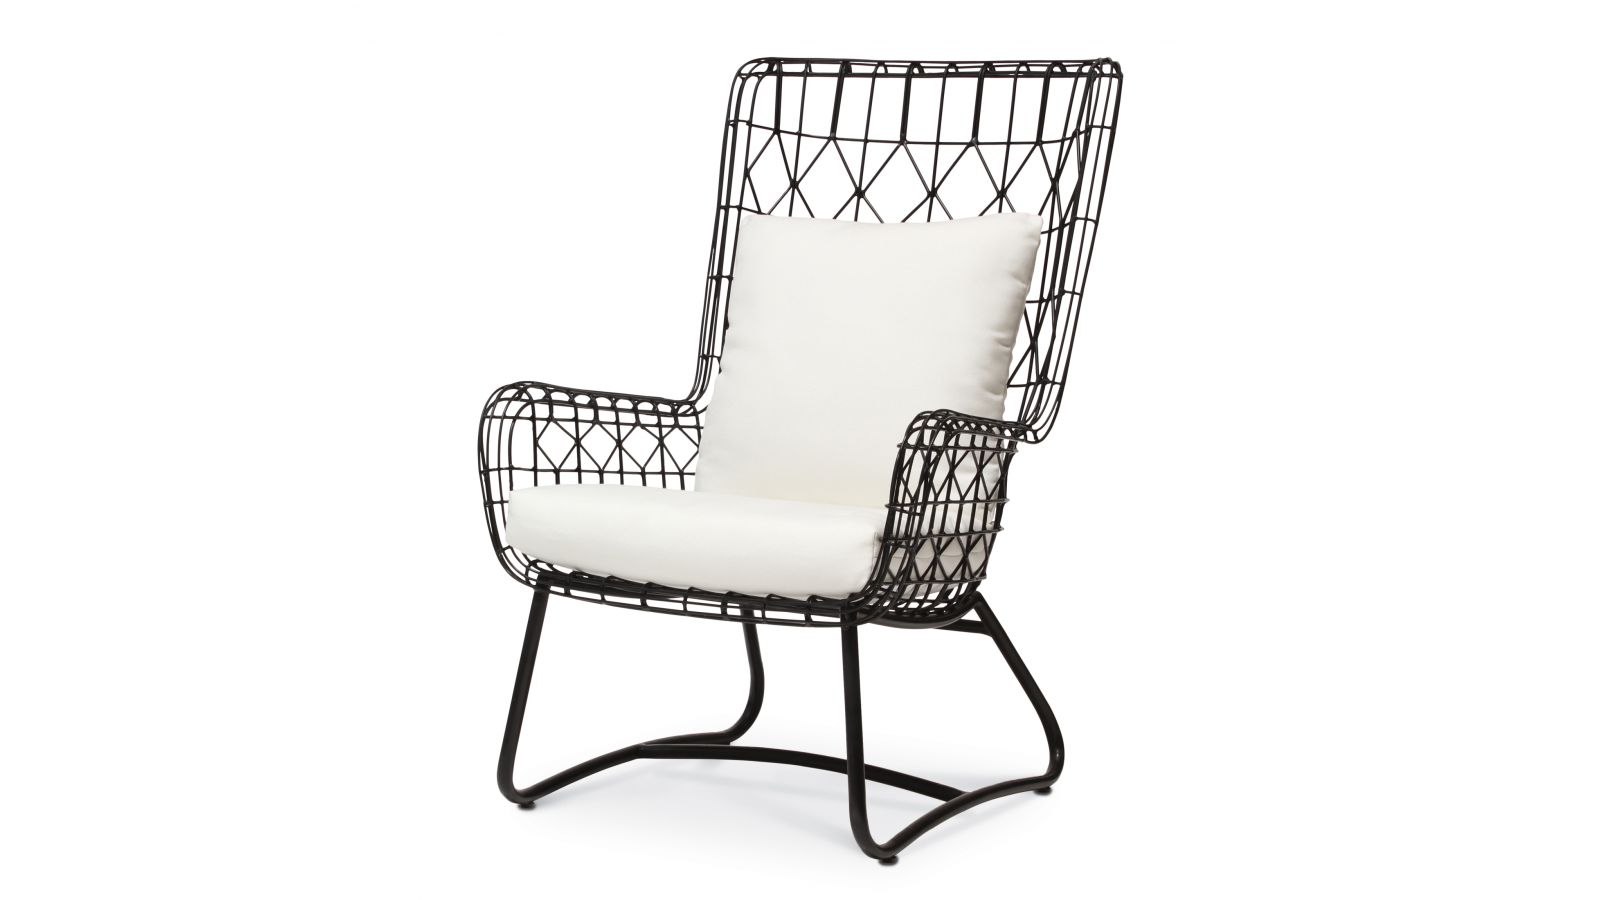 Capri Outdoor Wing Chair, Black